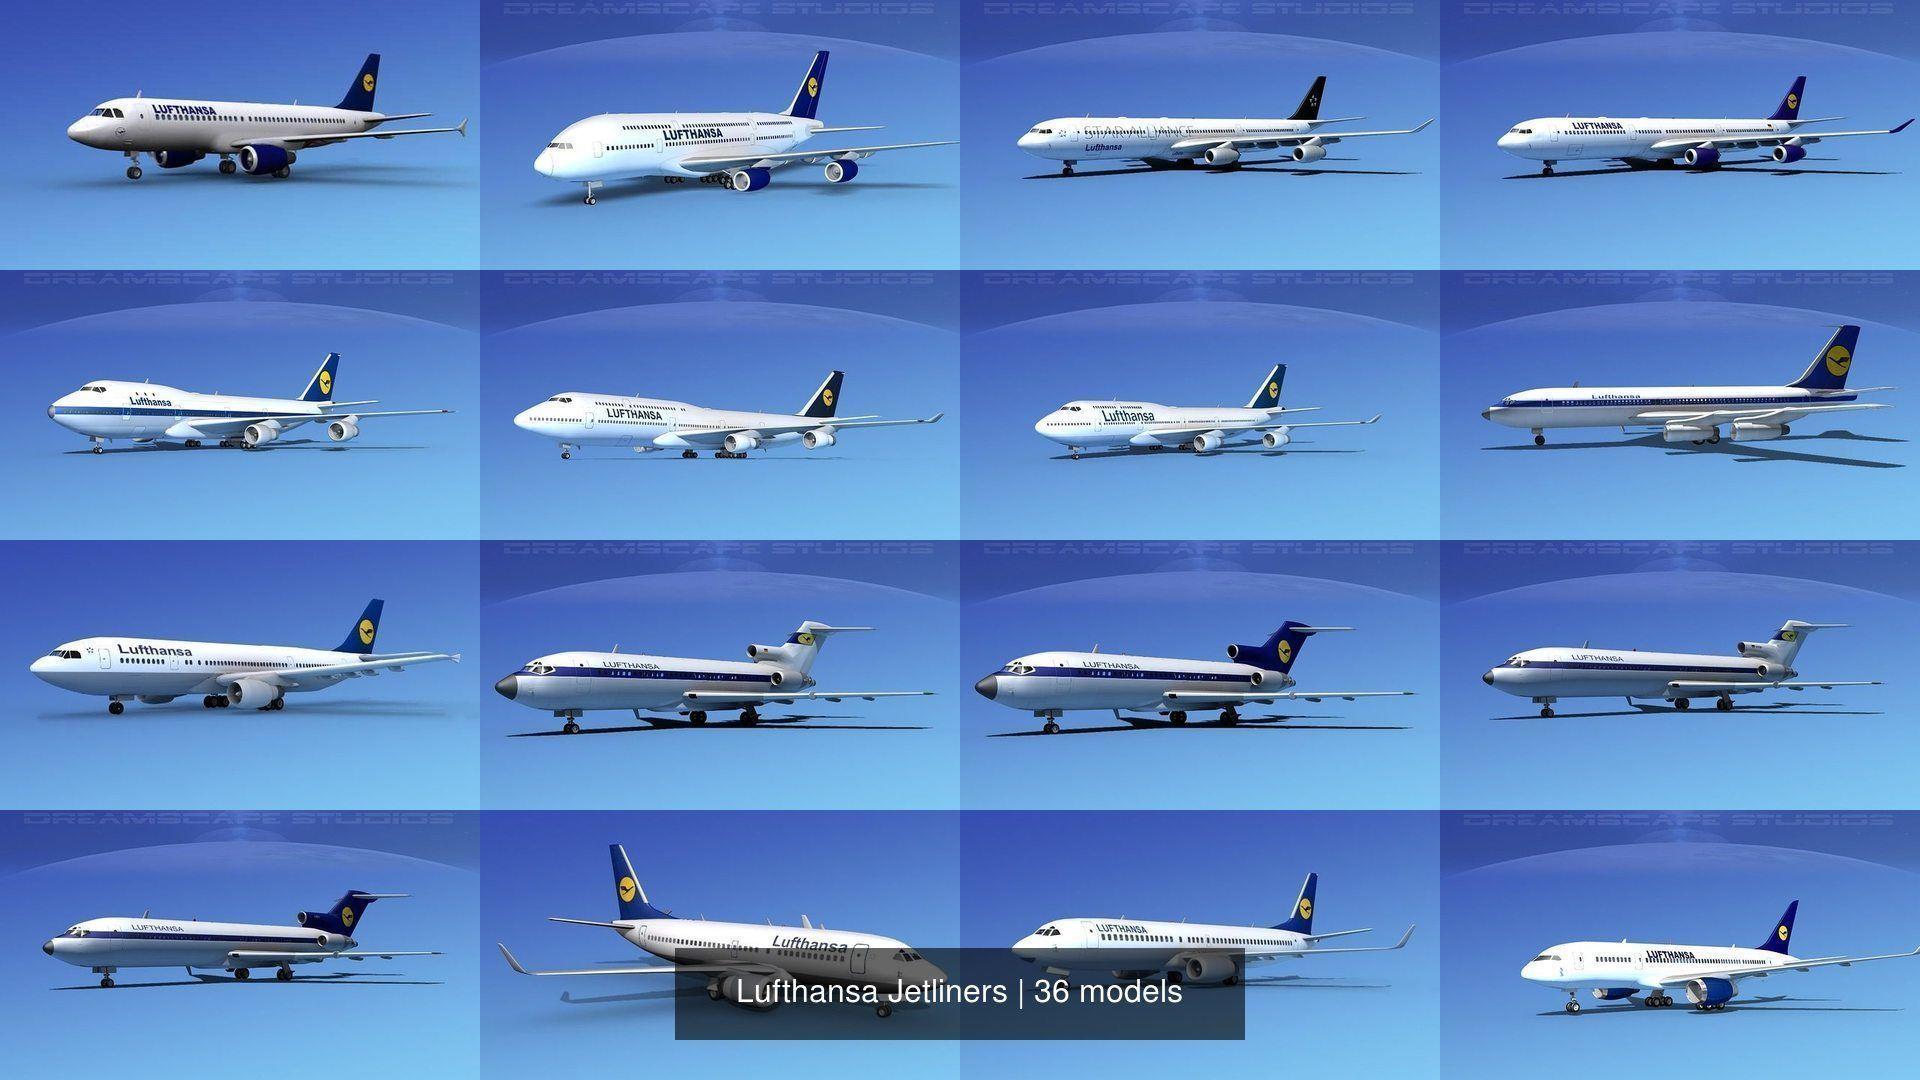 36 Lufthansa Jetliners